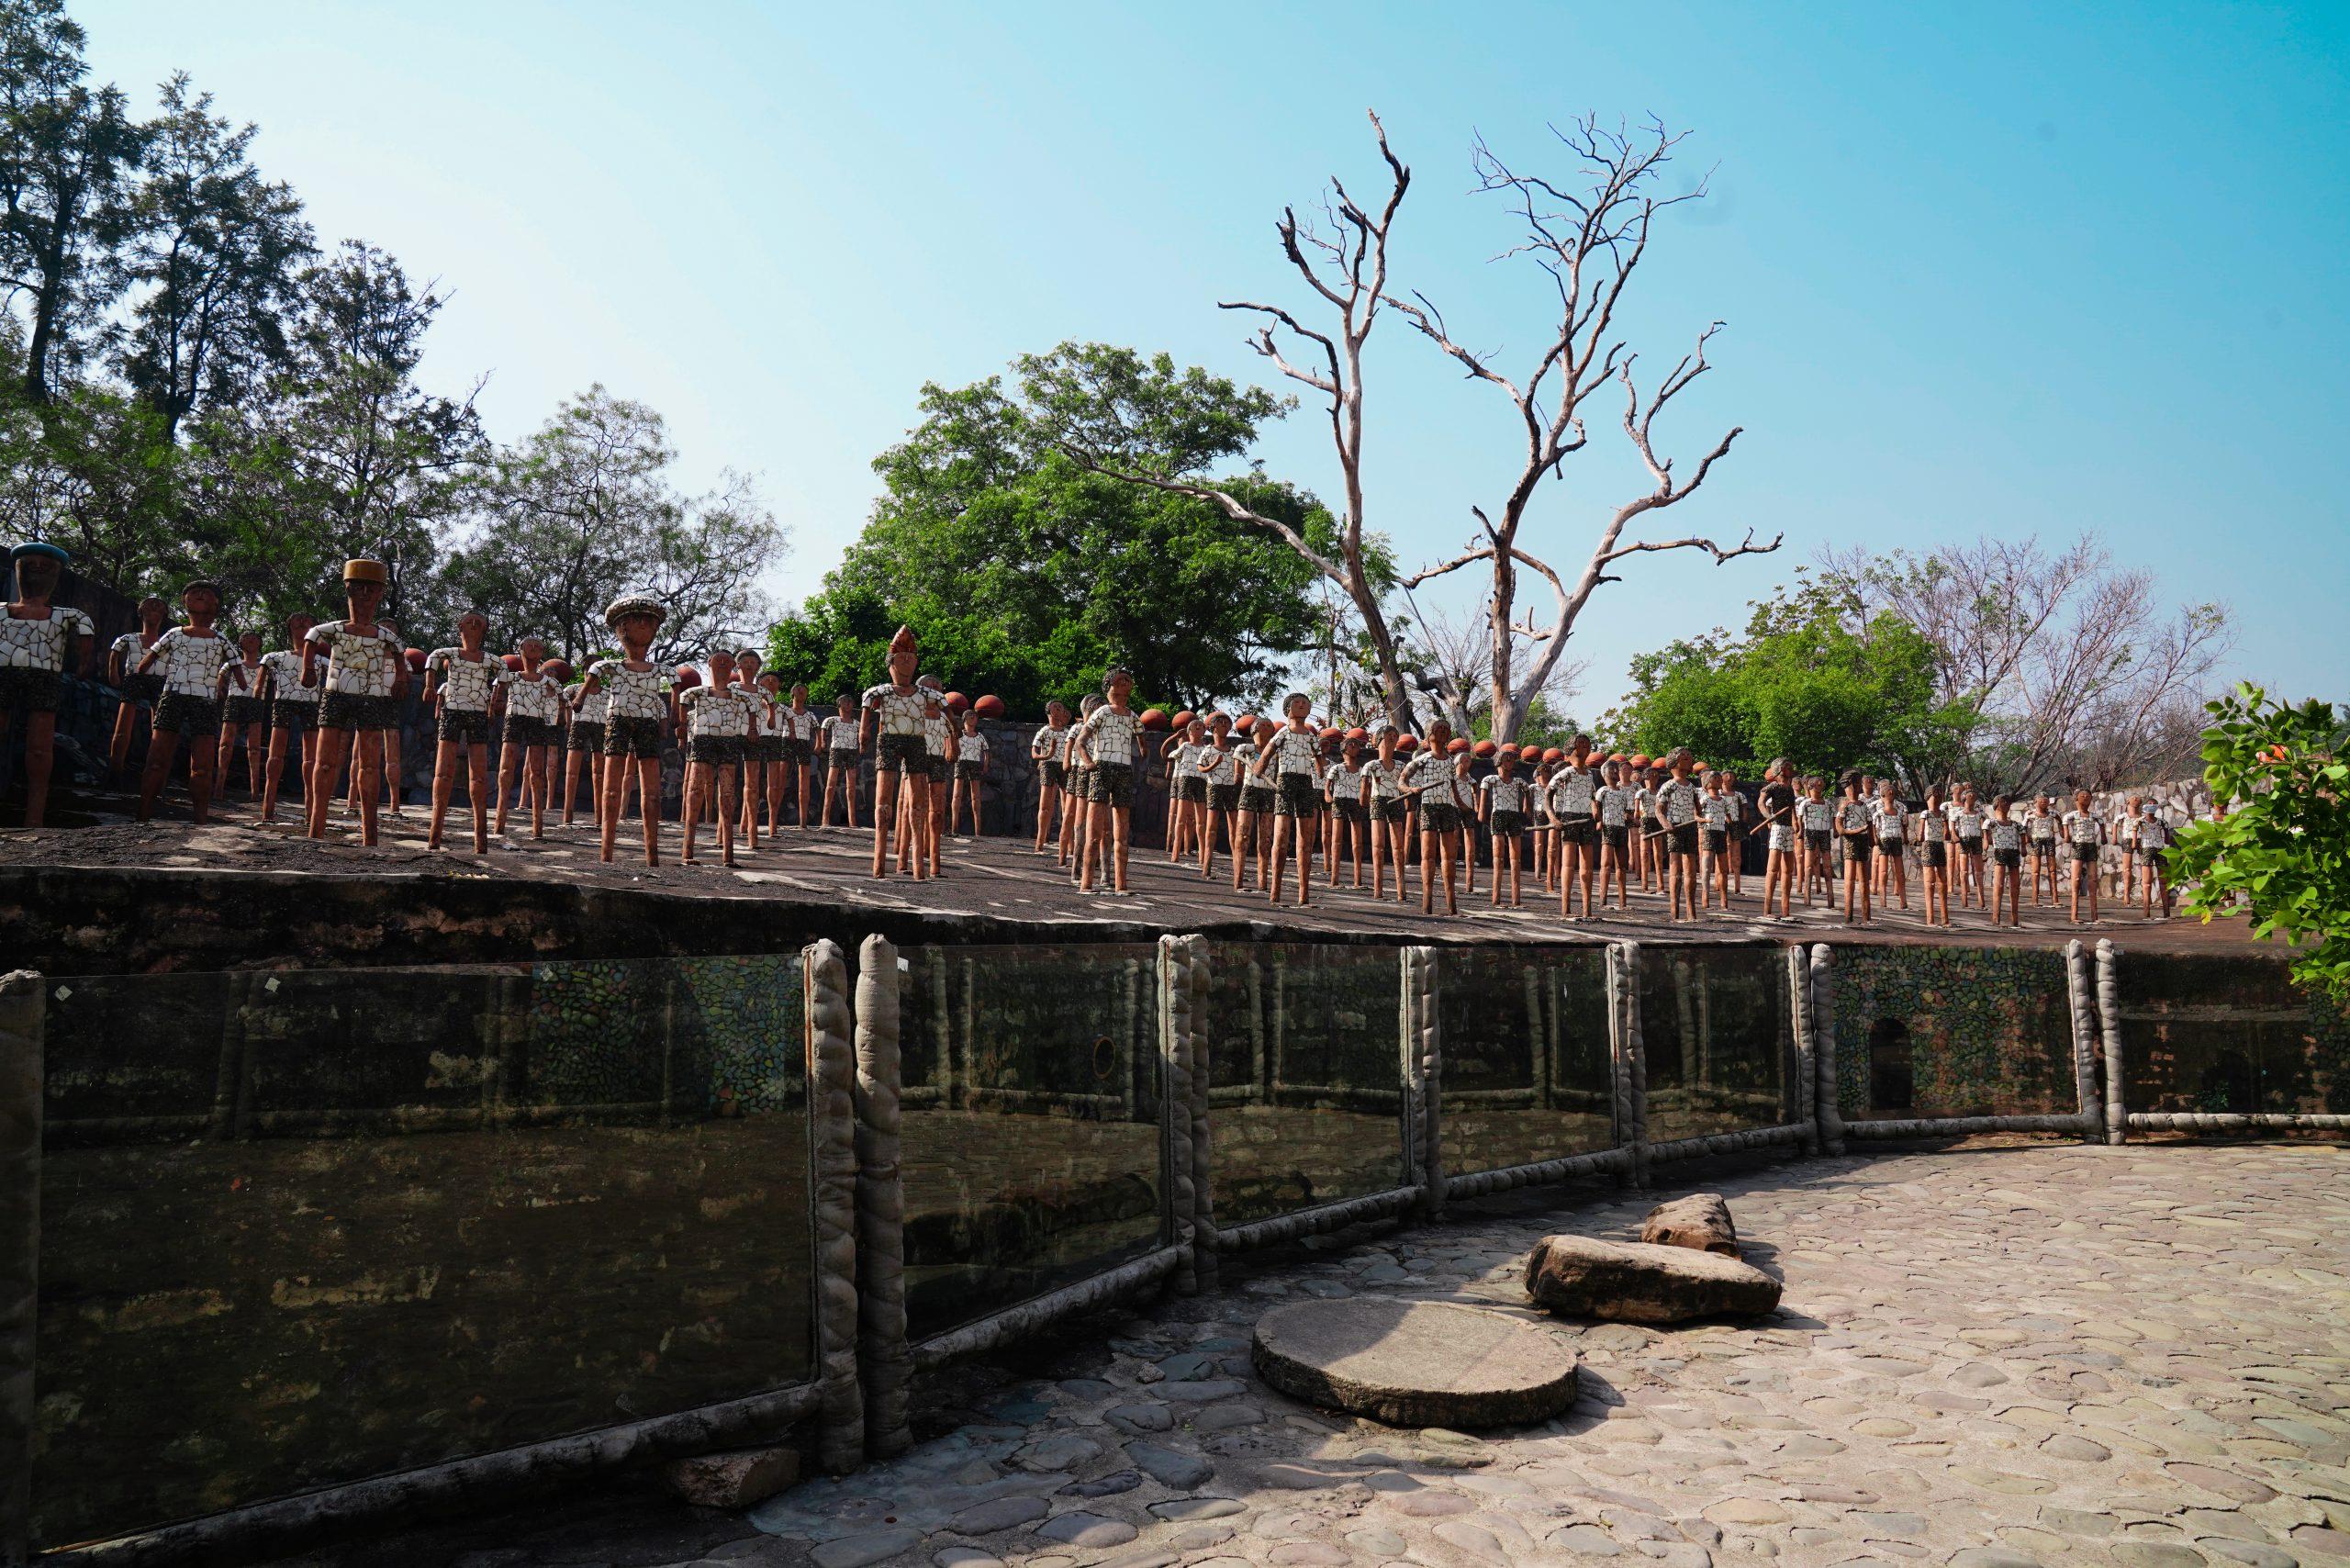 Statues in a rock garden, Chandigarh